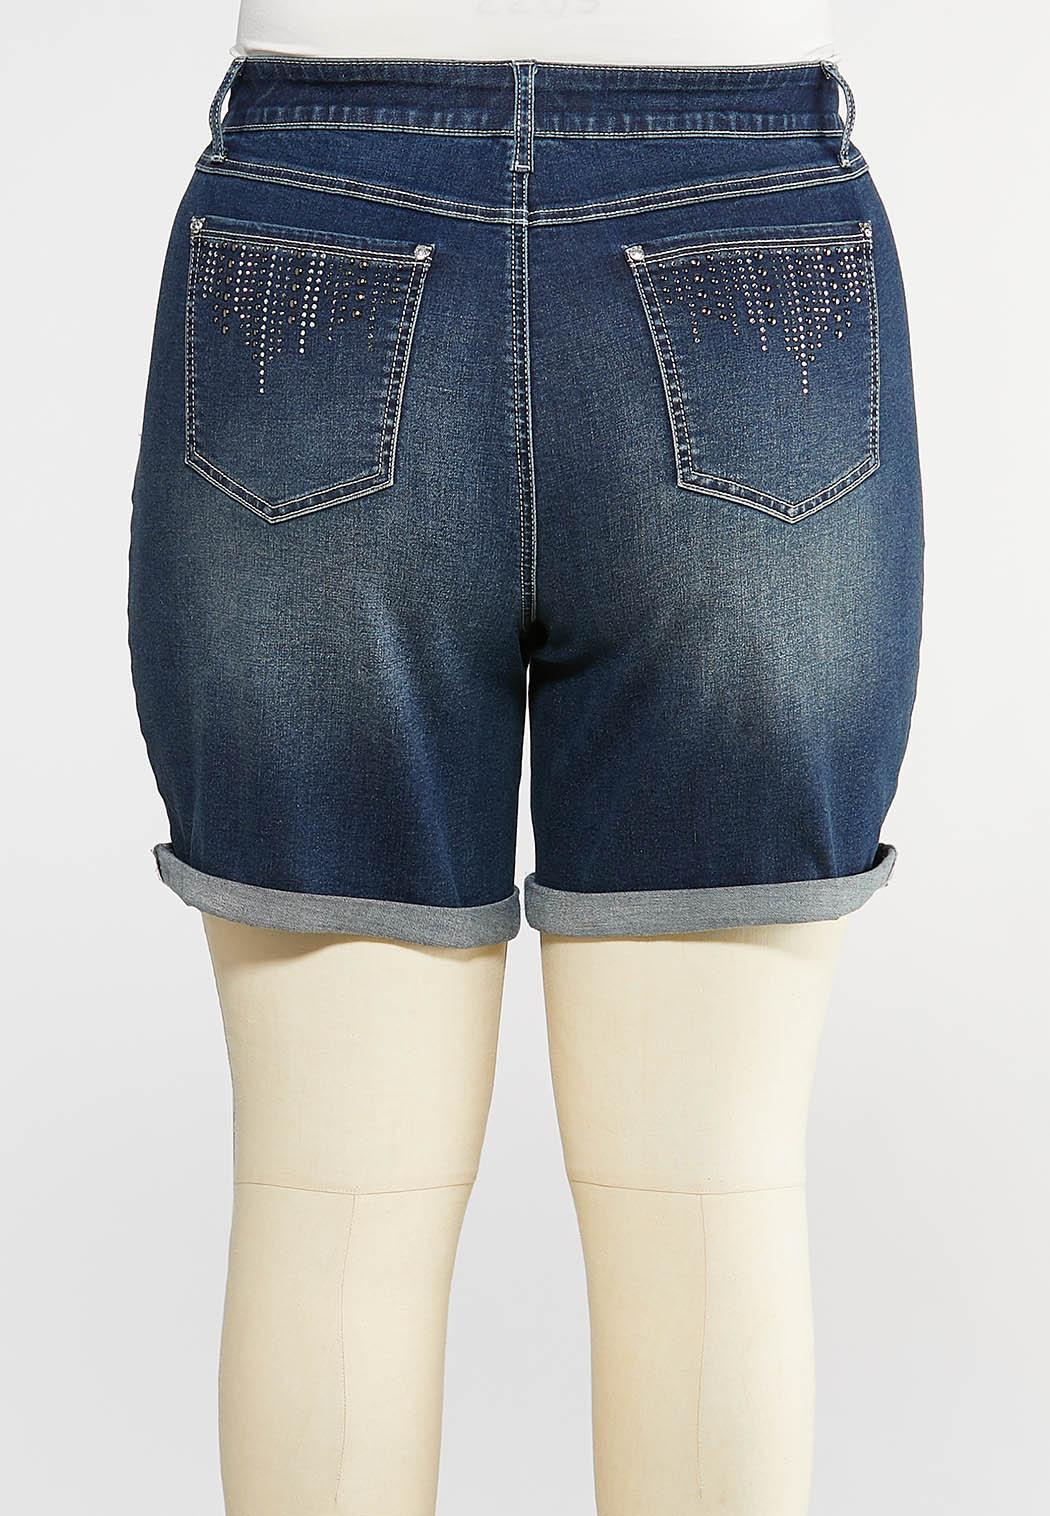 Plus Size Glitzy Stud Pocket Shorts